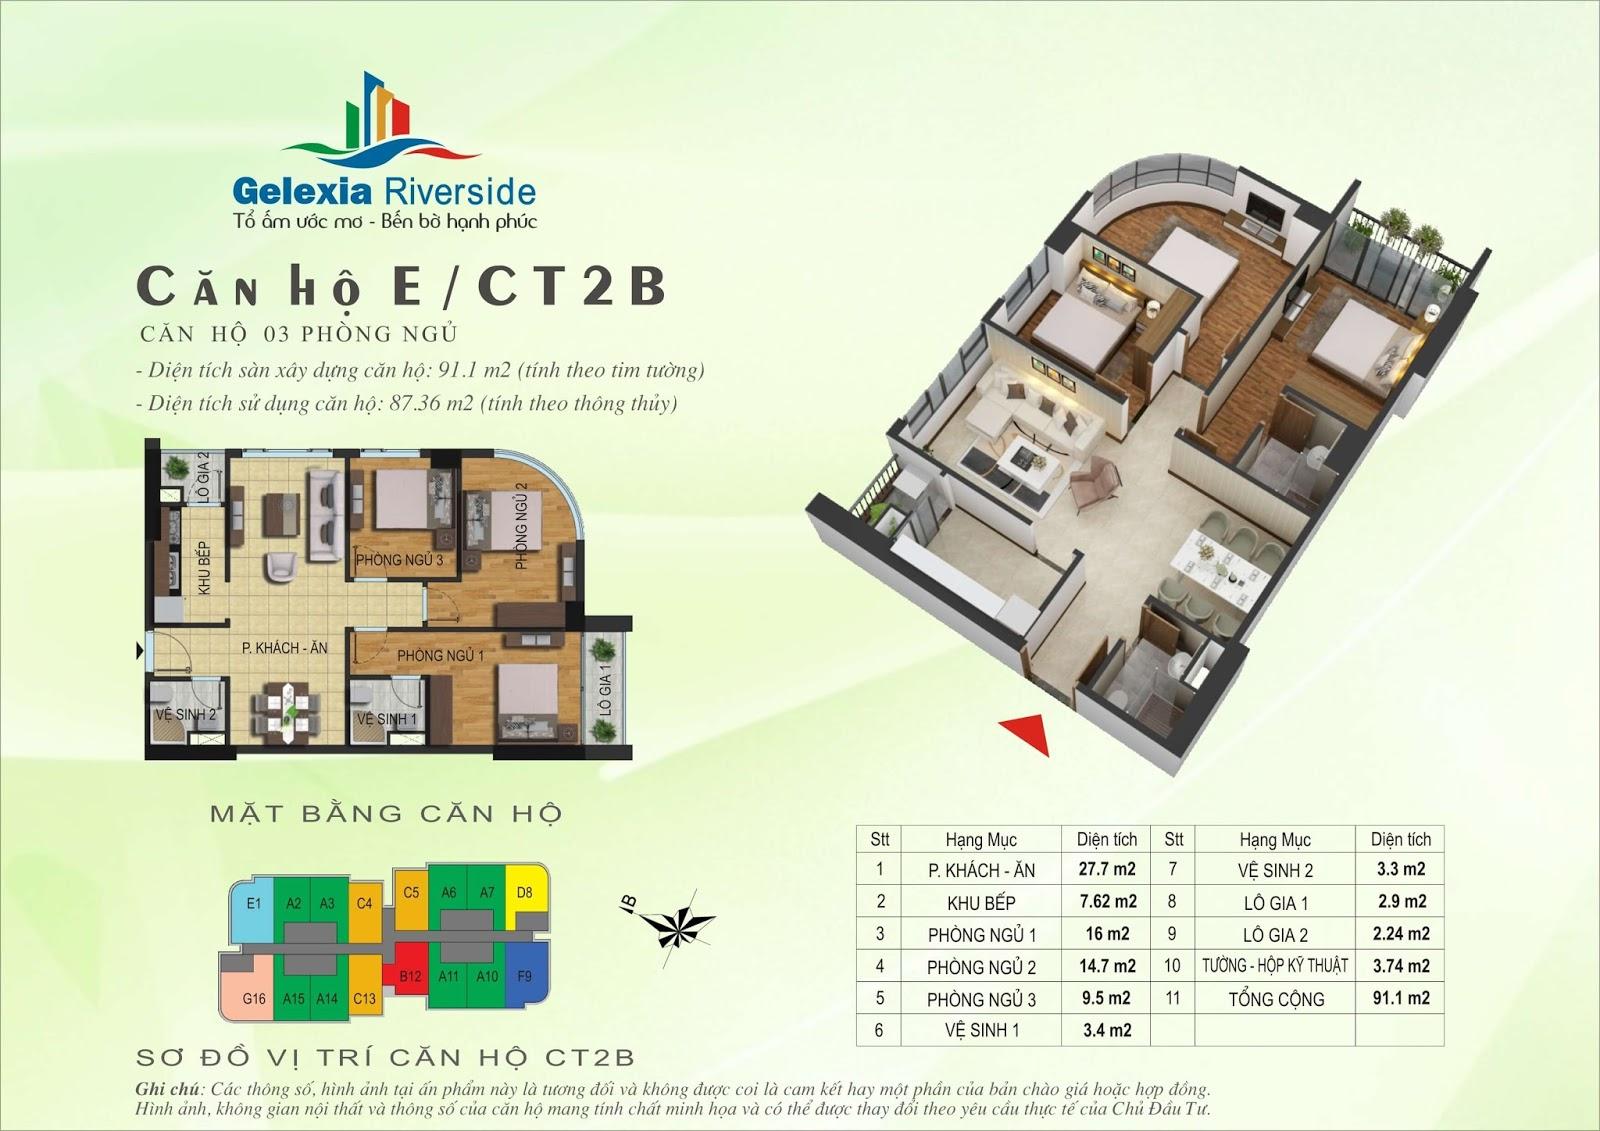 Mặt bằng căn hộ 91,1 m2 tòa CT2B - Gelexia Riverside